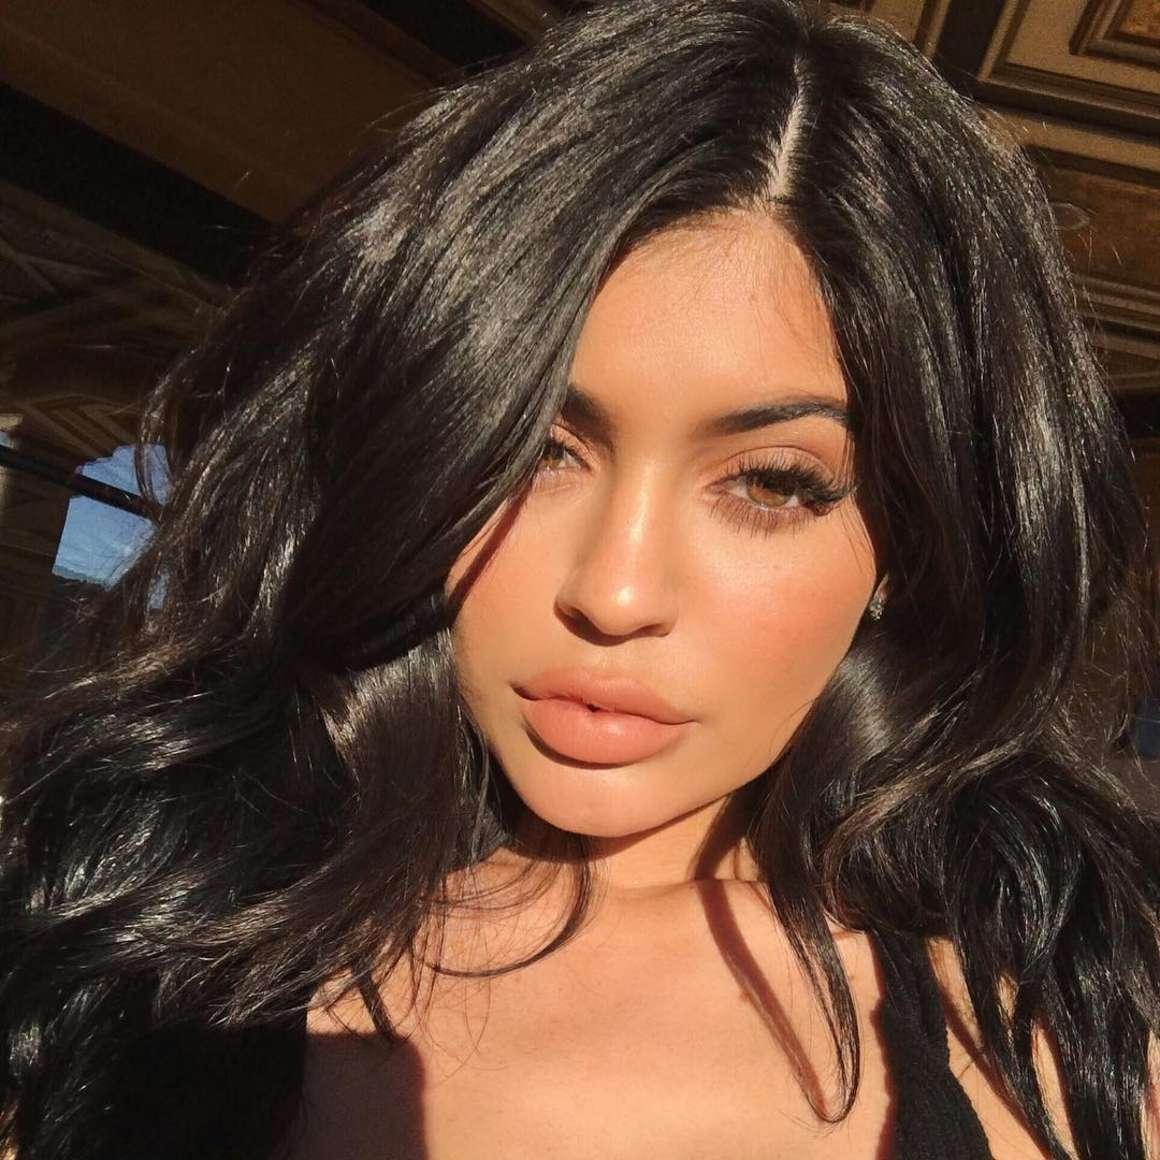 Kylie Jenner Social Media Indian Girls Villa Celebs